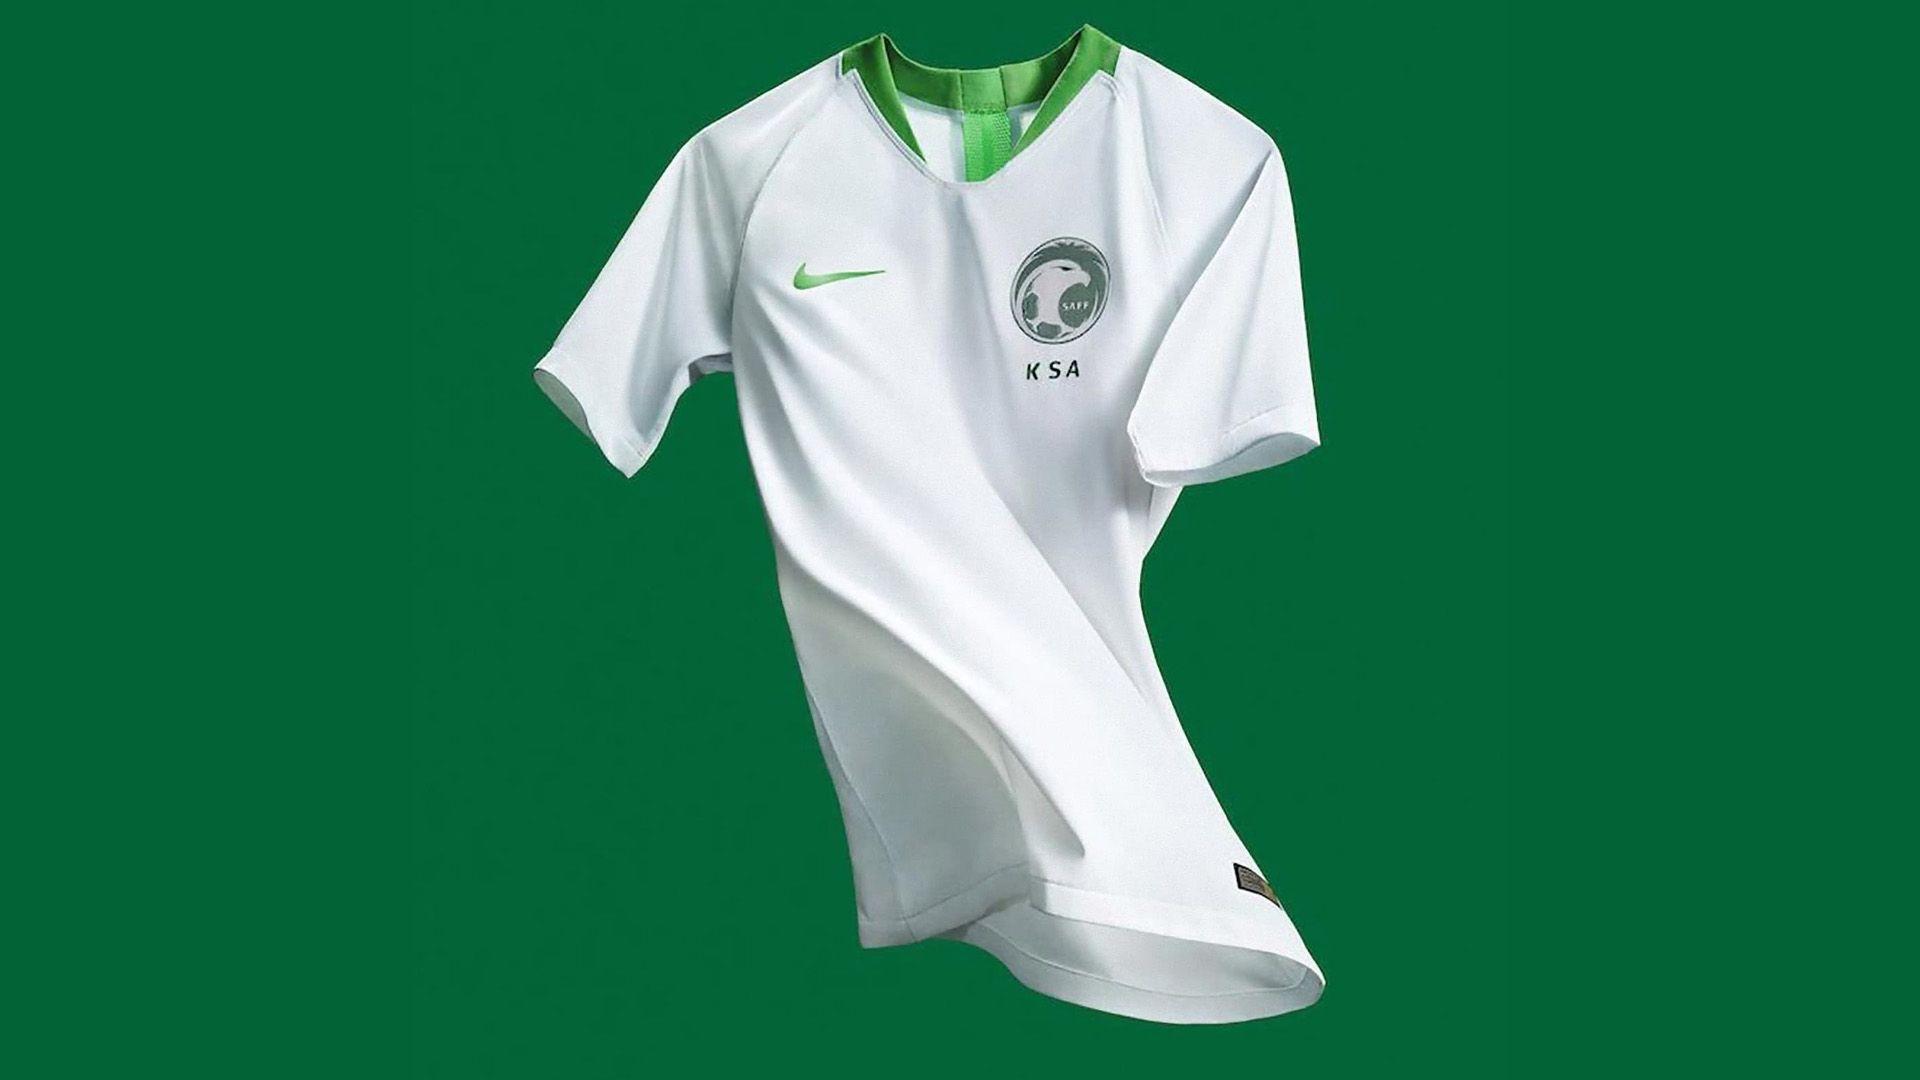 Arabia Saudita Camiseta Titular Saudi Arabia Home Kit 2018 ... ddef66ead4bc8